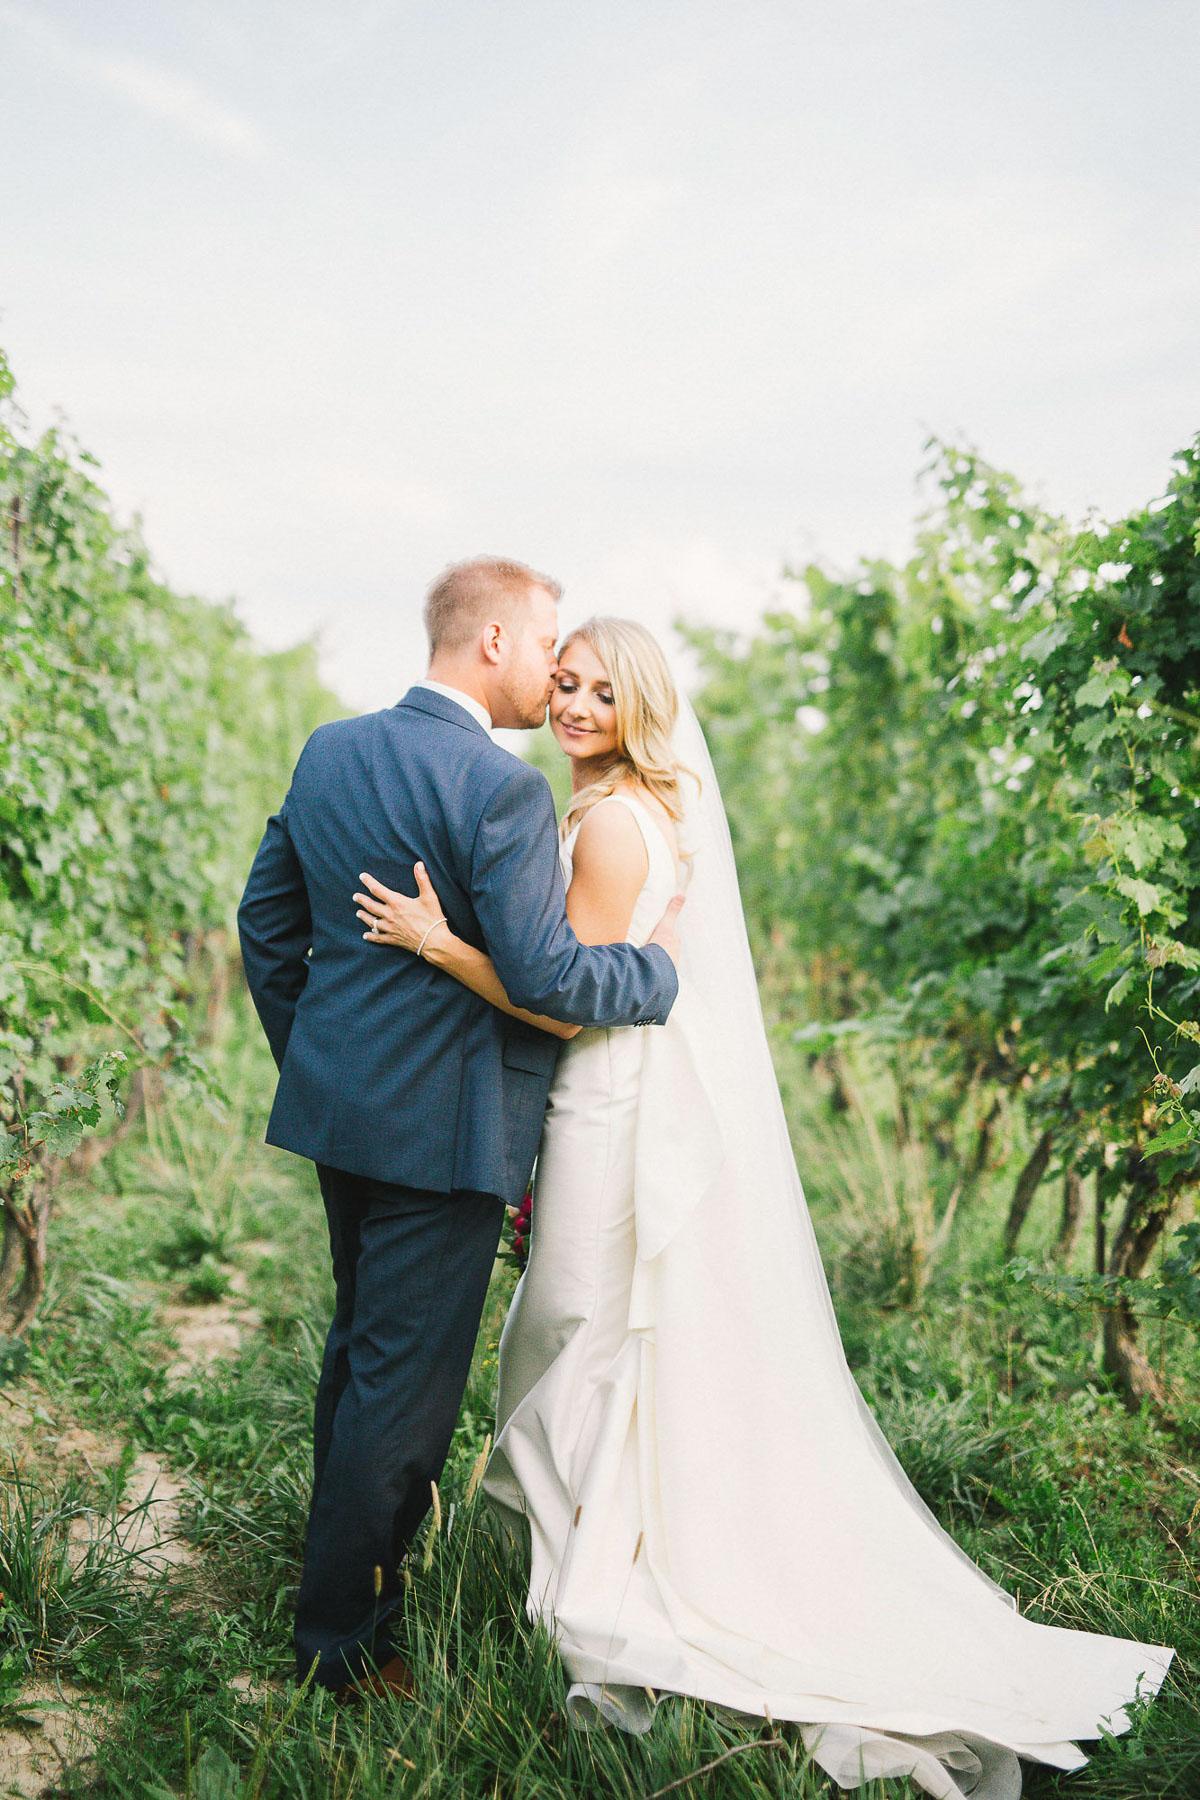 julia-park-photography-vineyard-bride-swish-list-stratus-winery-niagara-on-the-lake-wedding-24.jpg